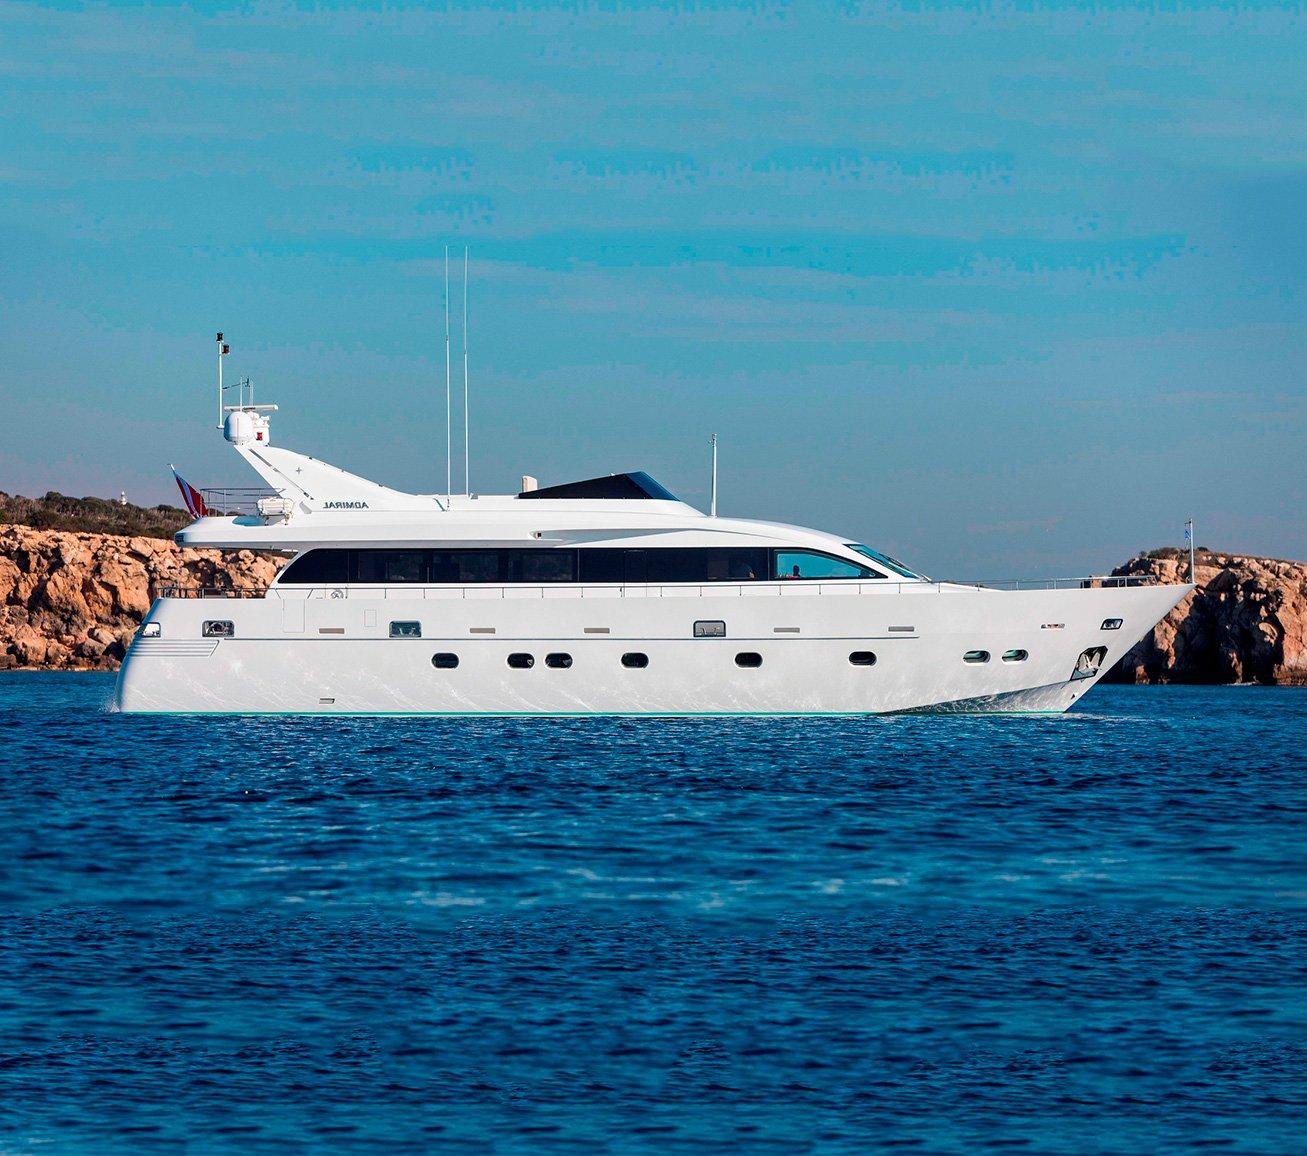 Nashira Yacht - Profile | Flagship-yachts.com